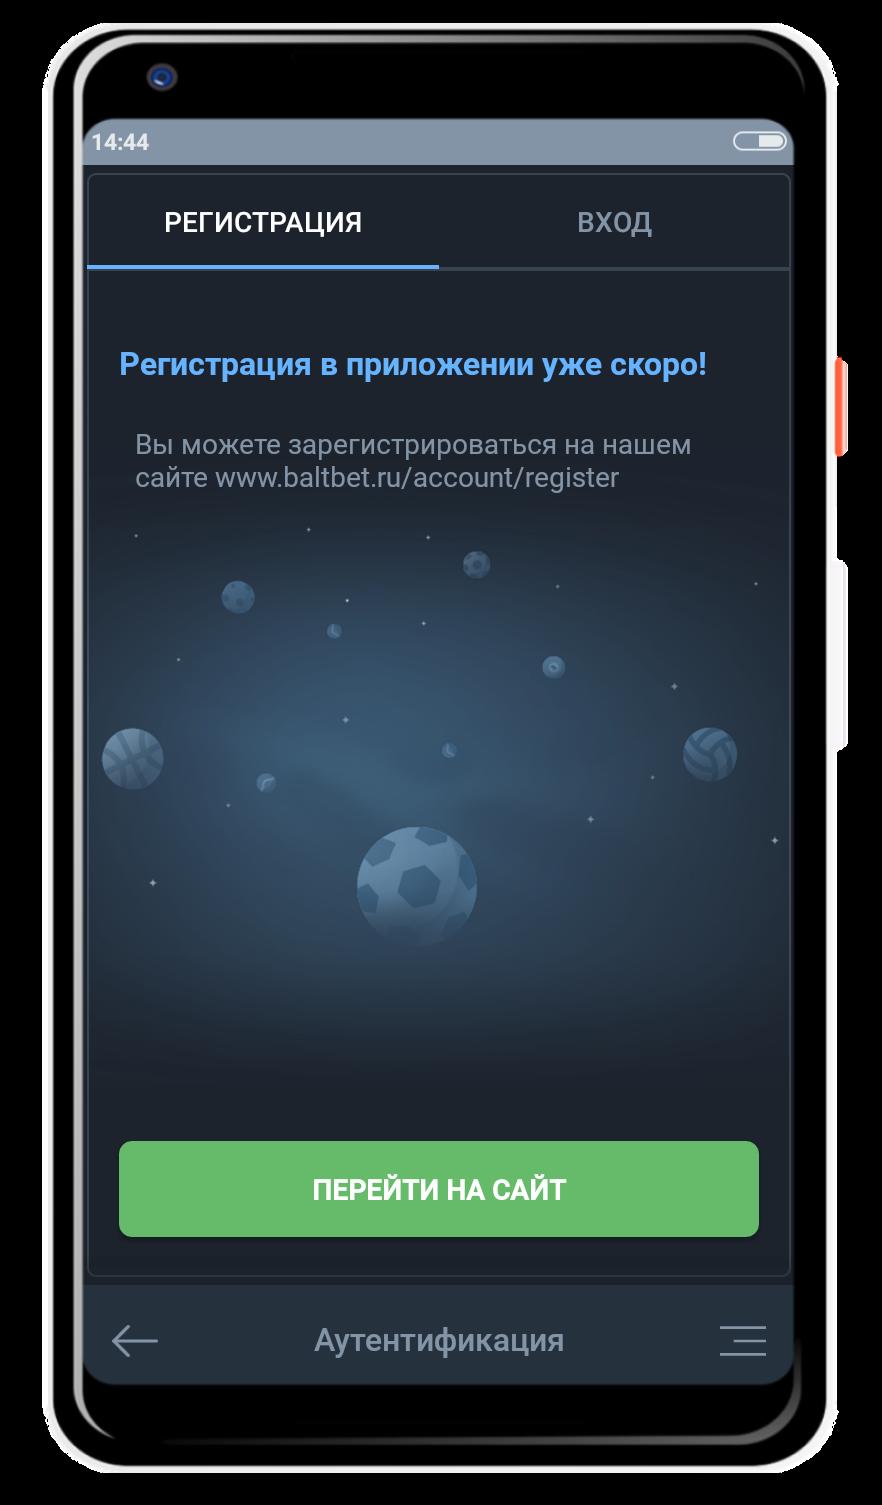 переход на м версию baltbet ru